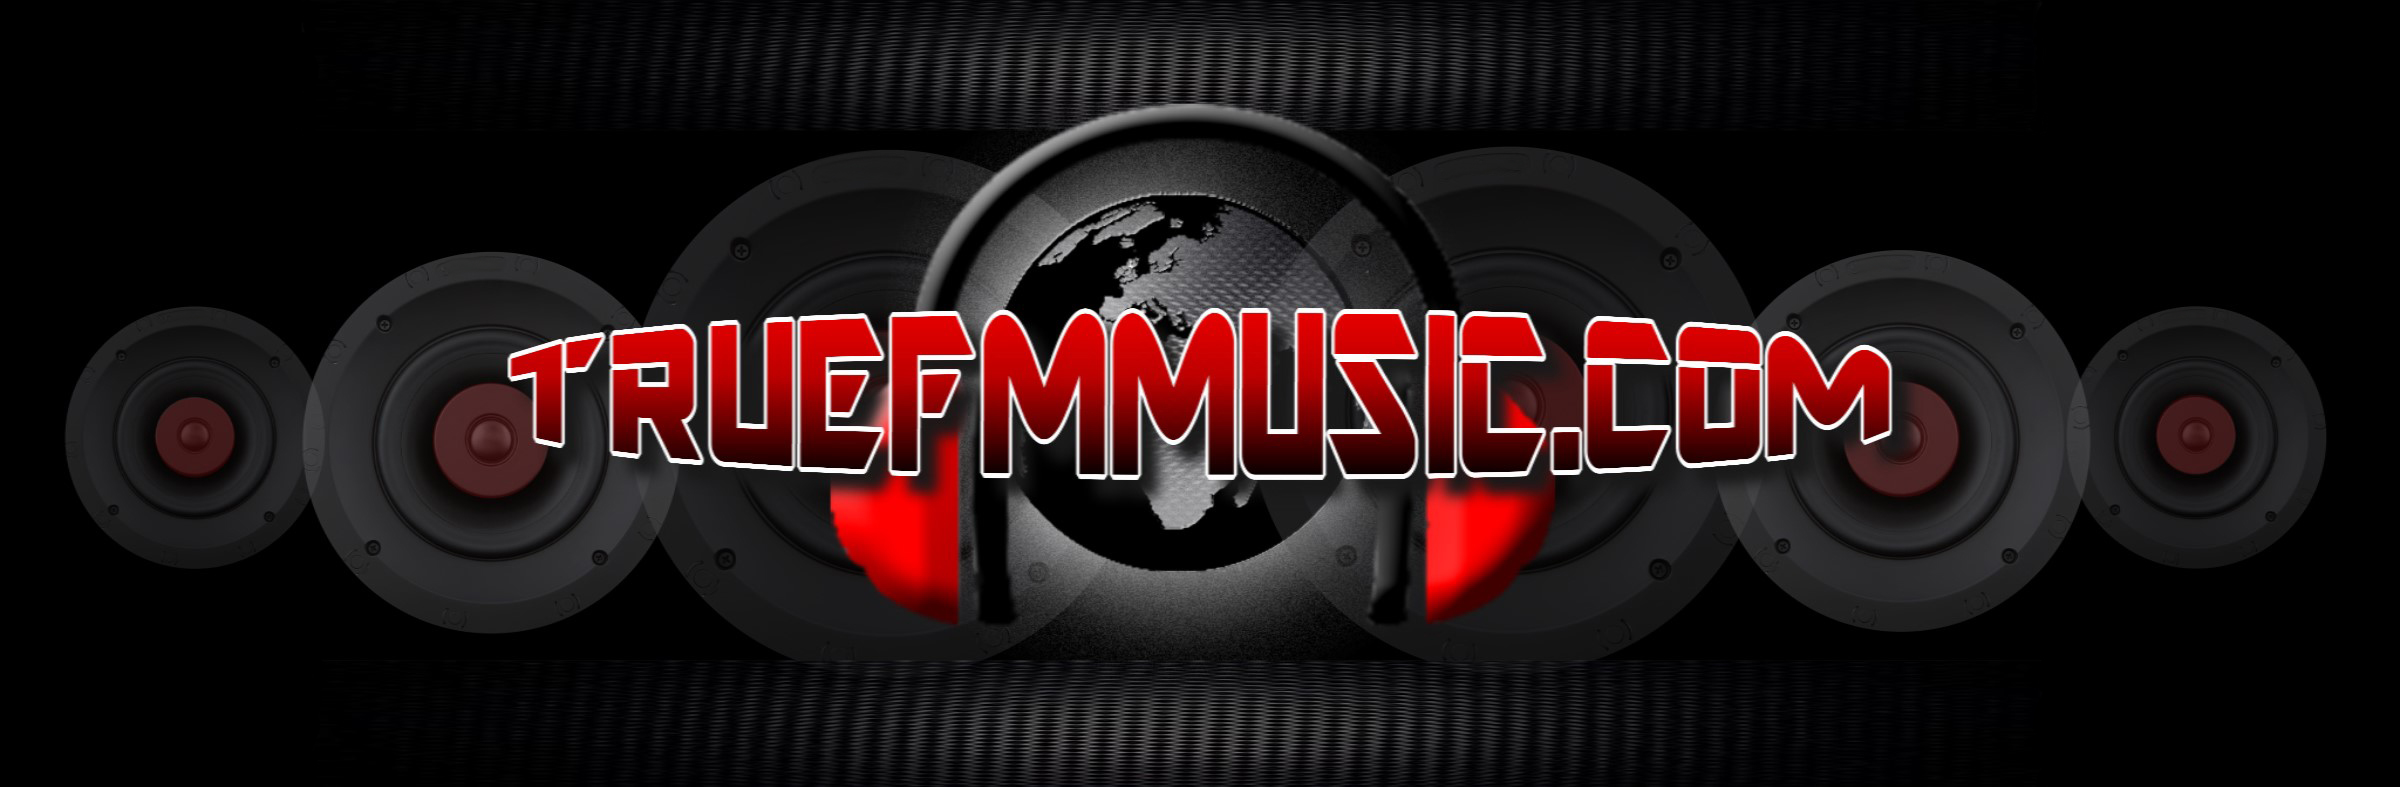 Truefmmusic.com R&B